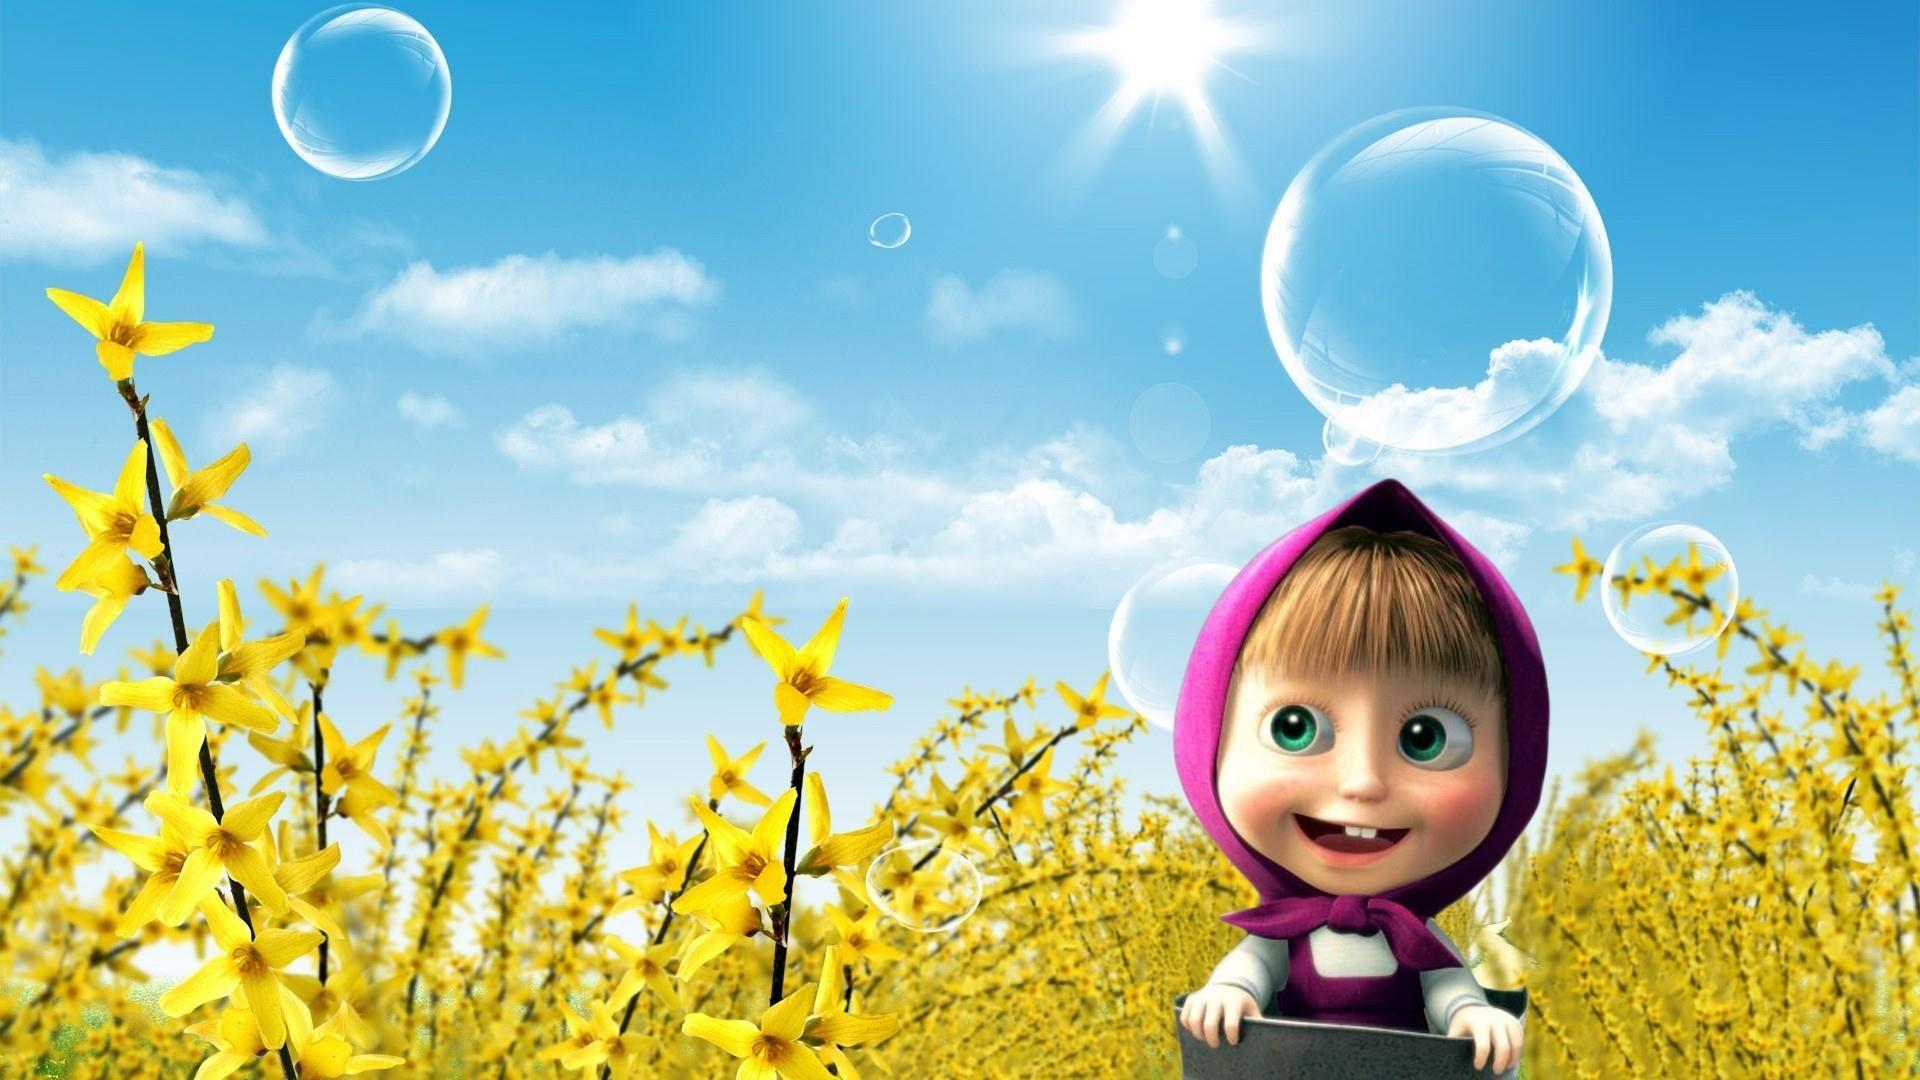 Get Free Printable Masha And The Bear Baby Shower Invitation Template Cartoon Wallpaper Animation Wallpaper Animated Wallpaper